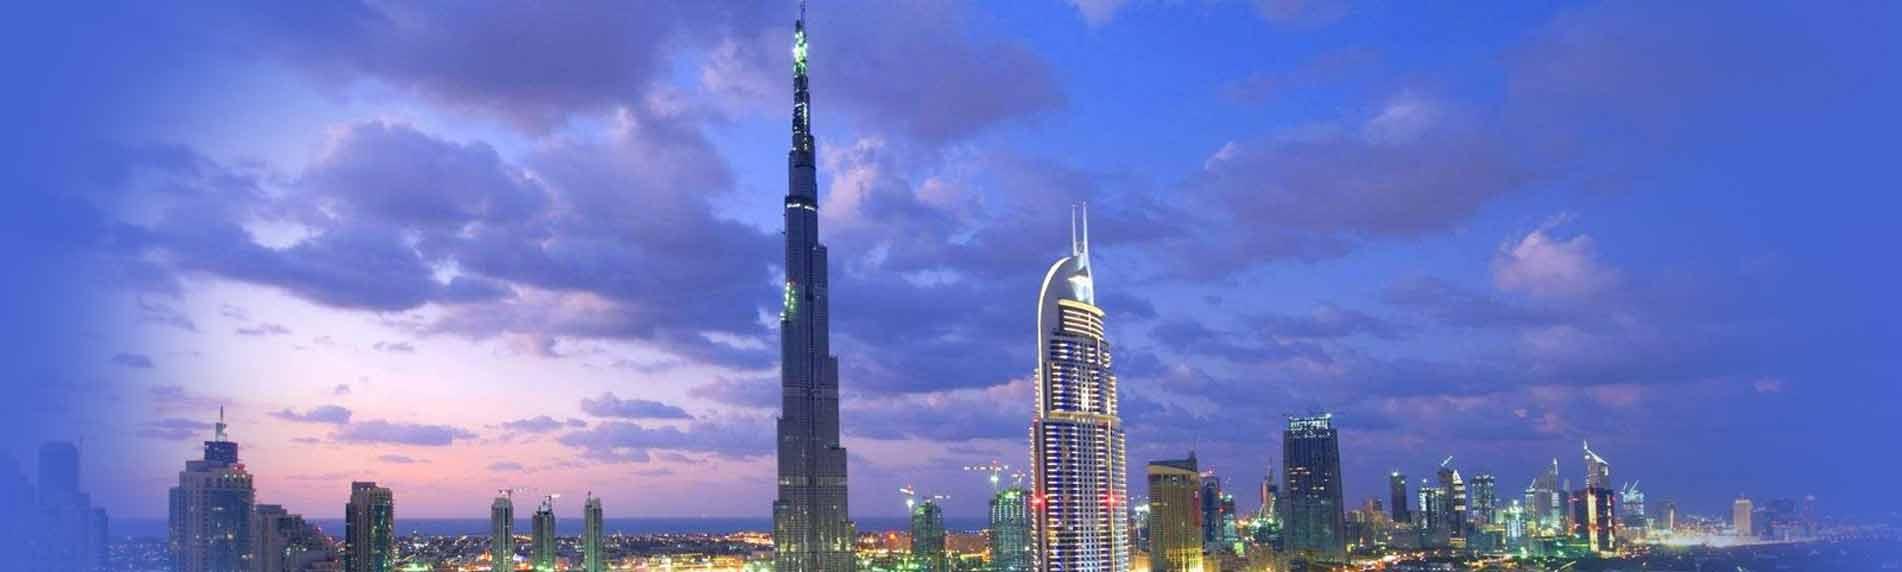 burj khalifa dubai fast track